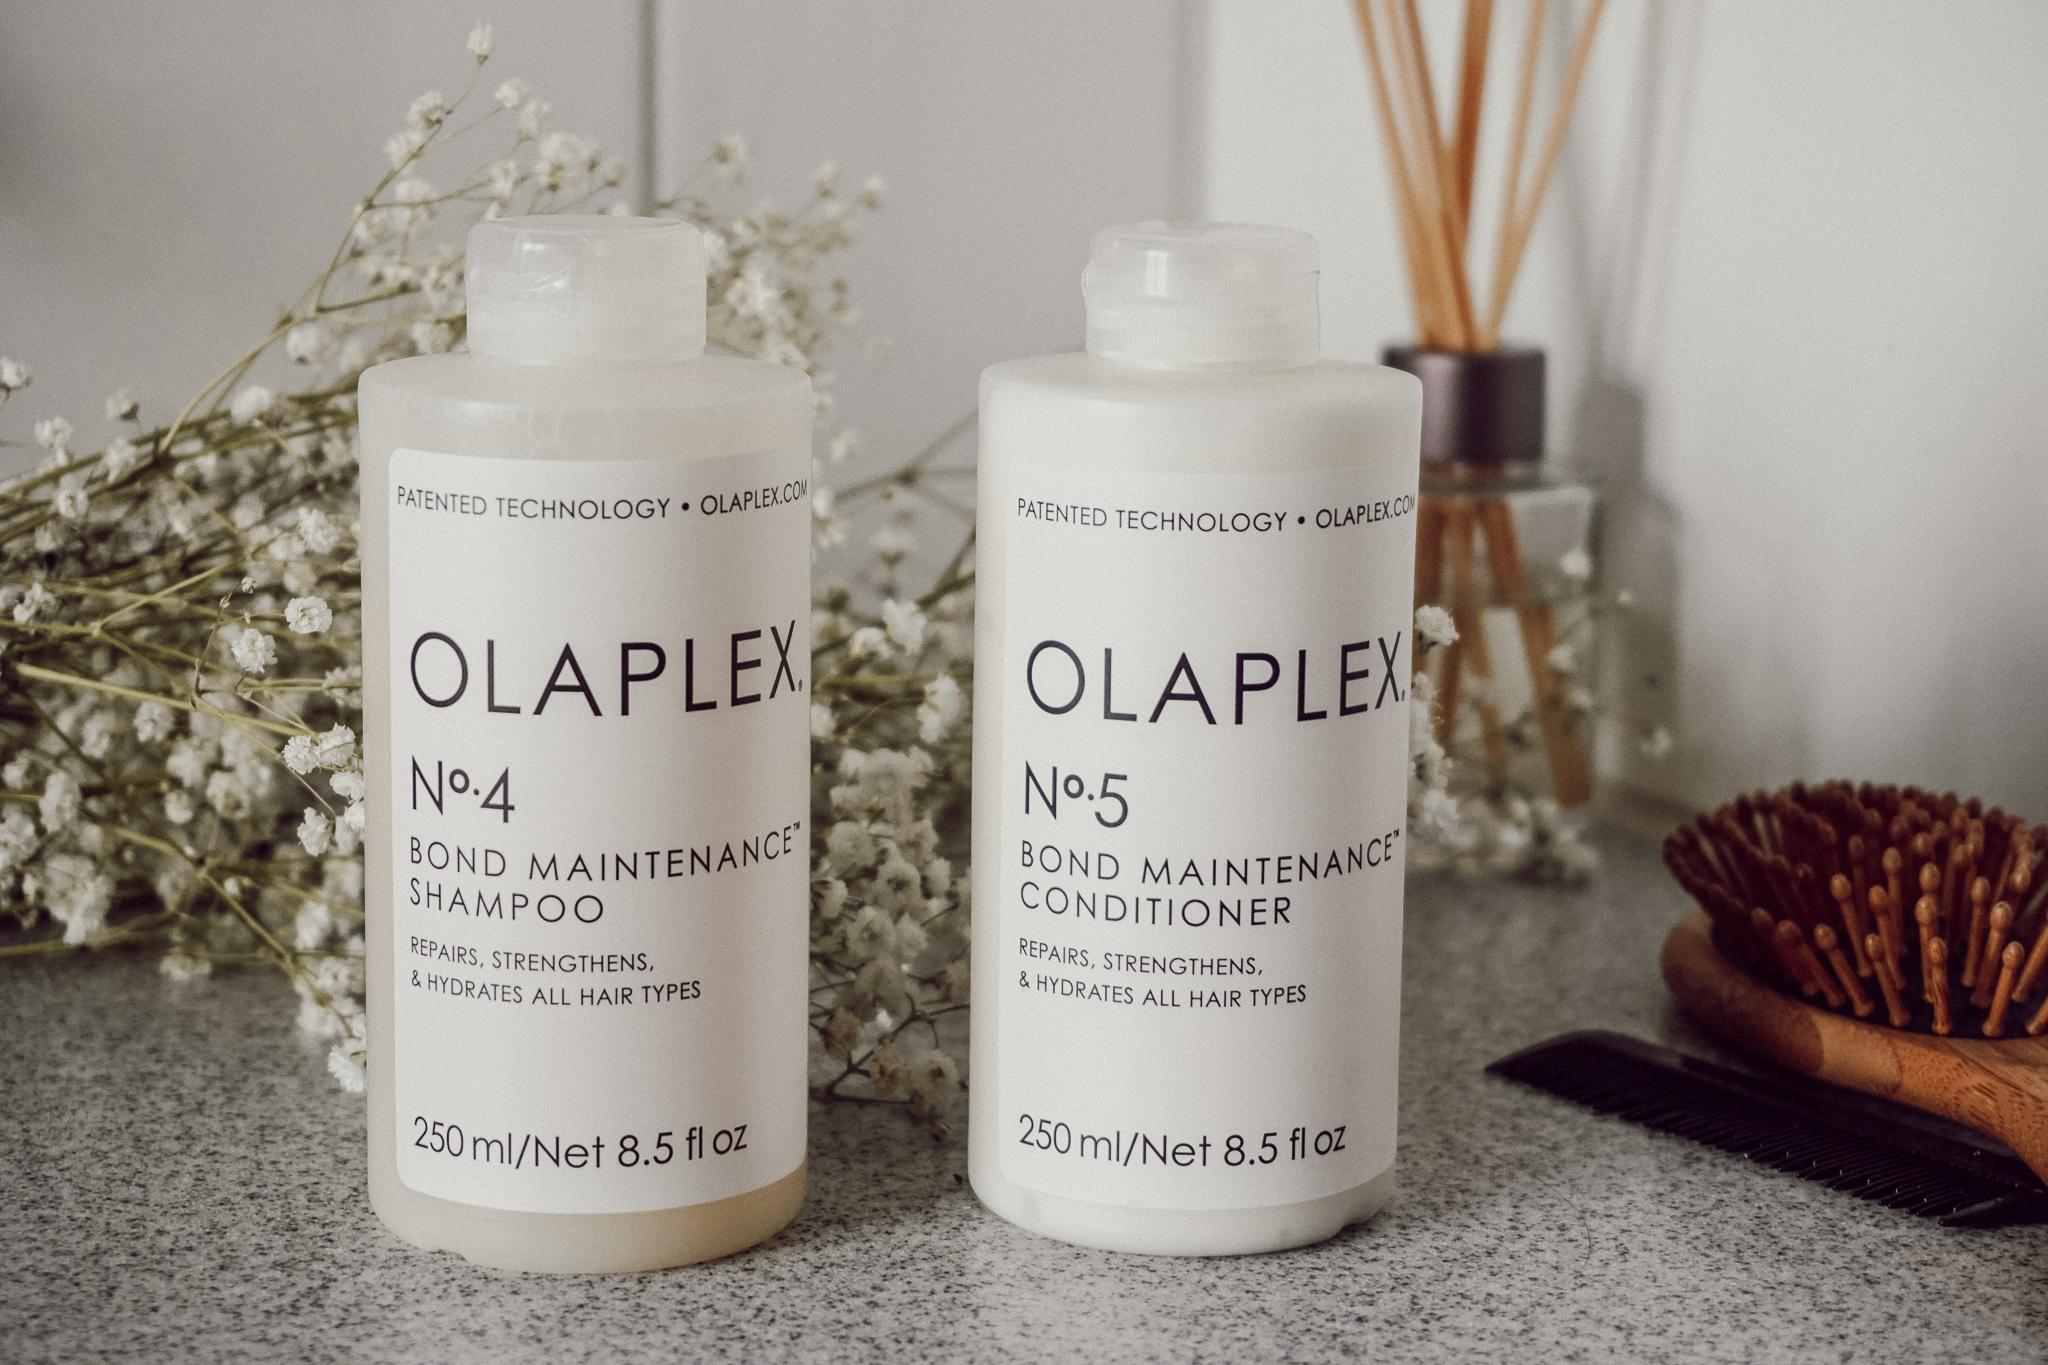 Olaplex N°4 shampoo Olaplex N°5 conditioner